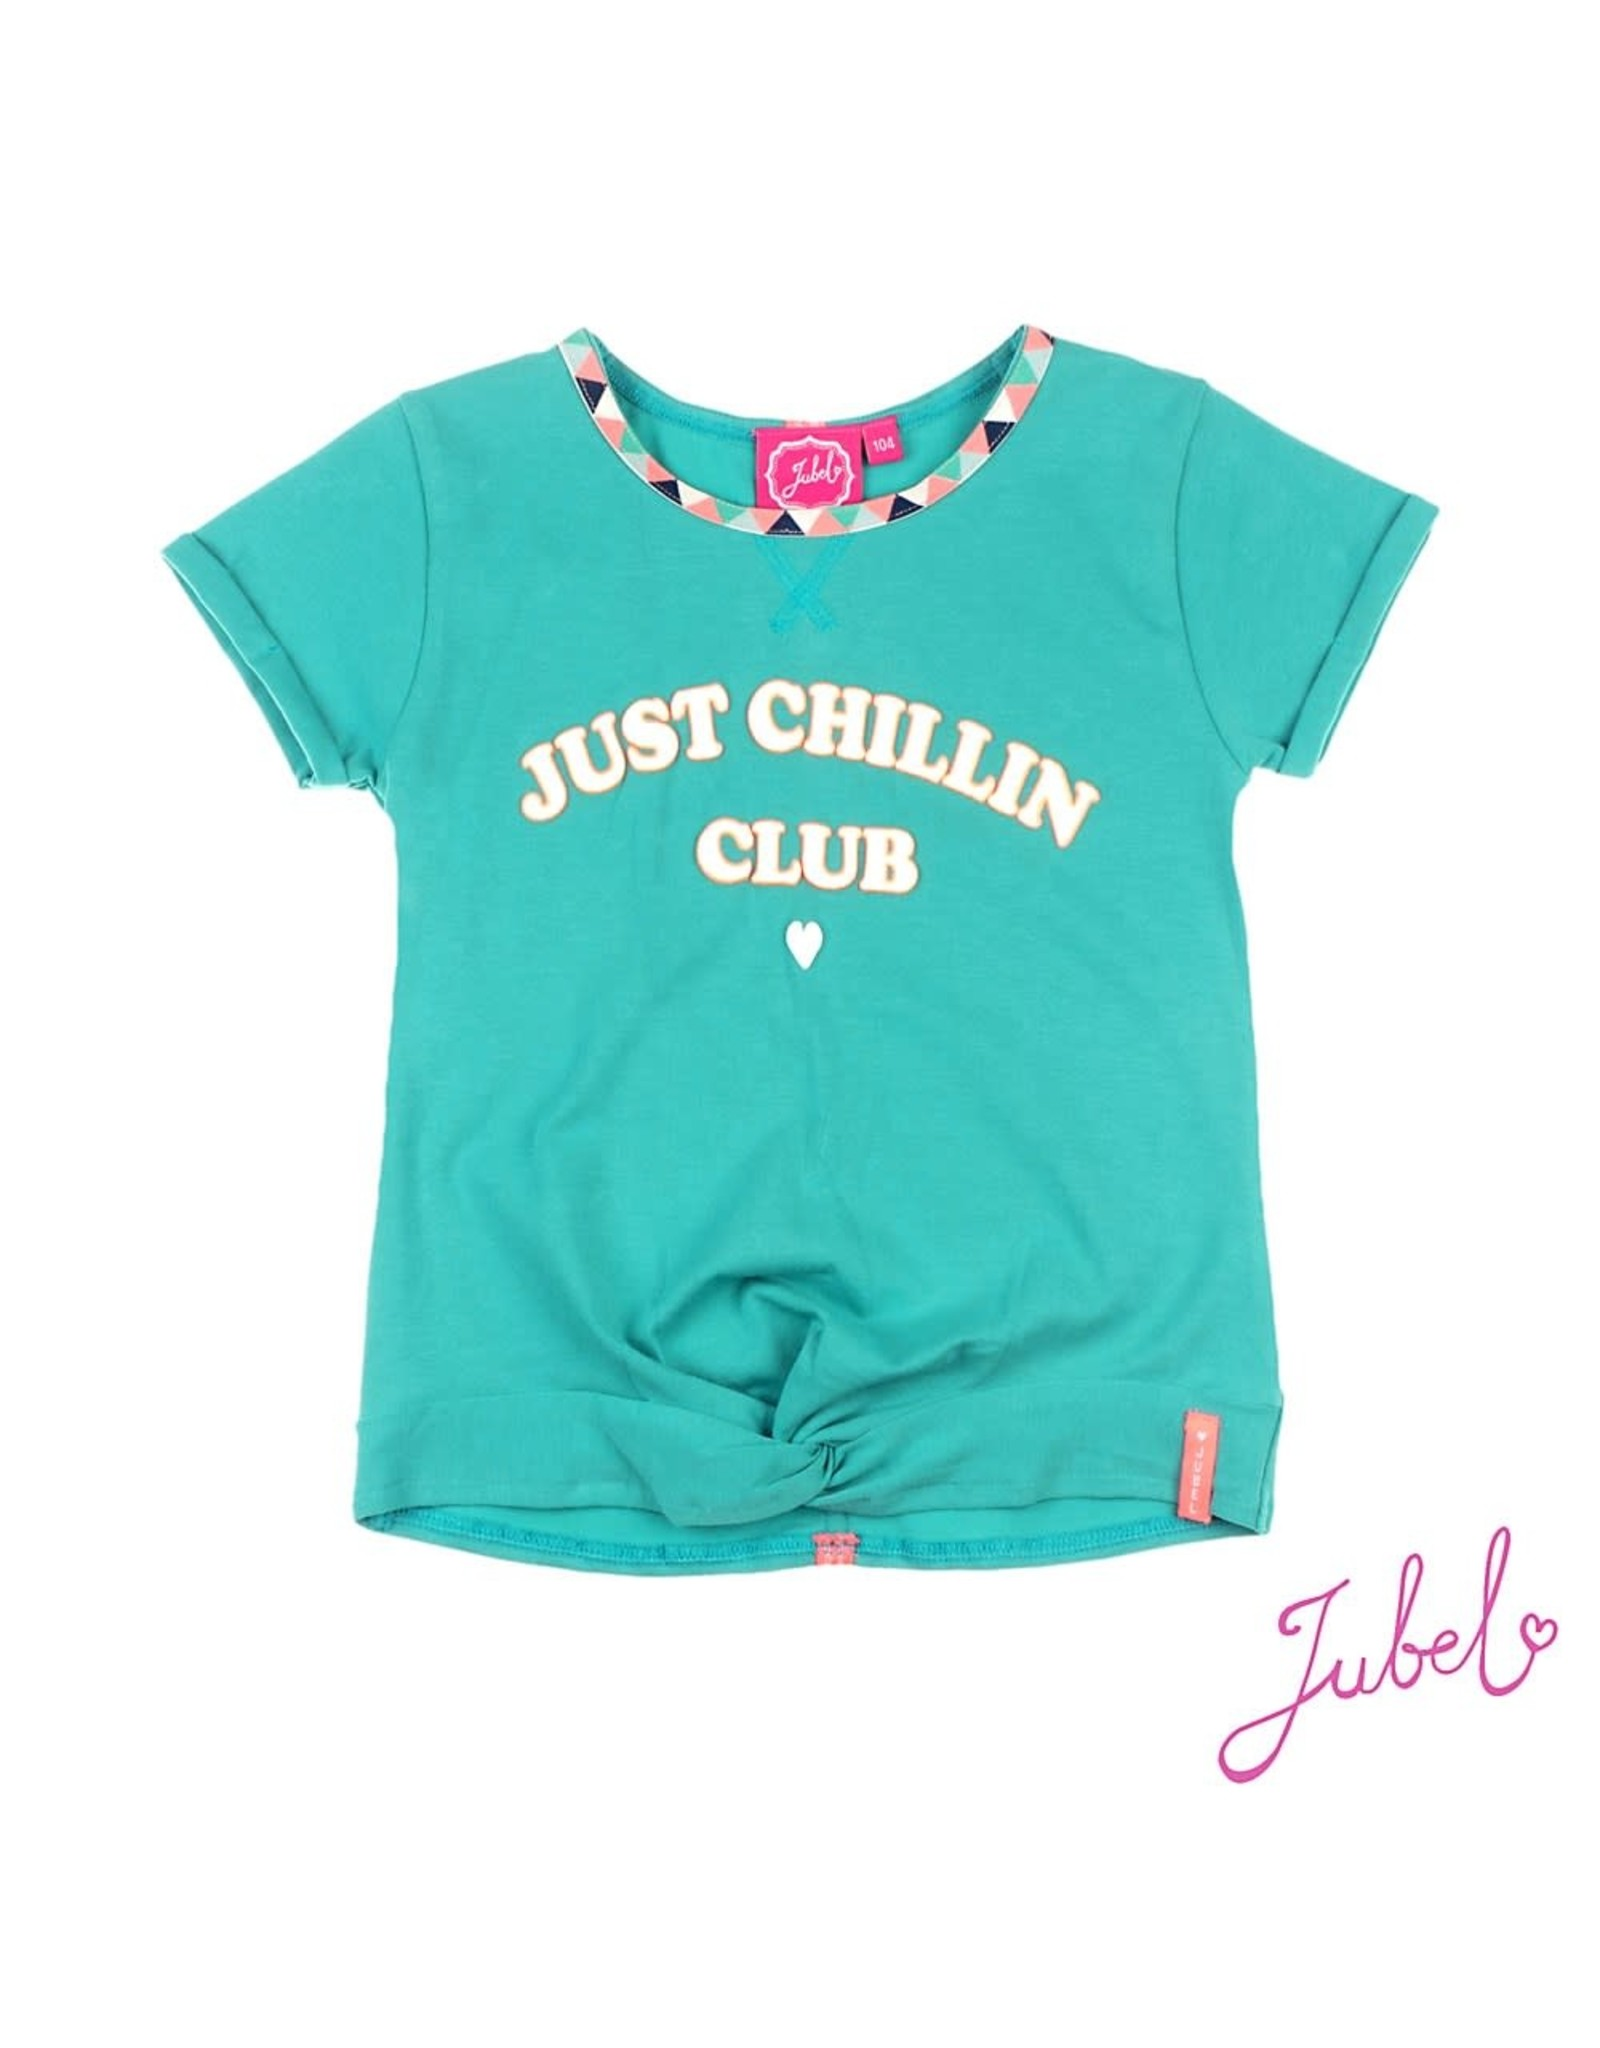 Jubel Crop Top Just Chillin Club - Botanic Blush Jade Groen